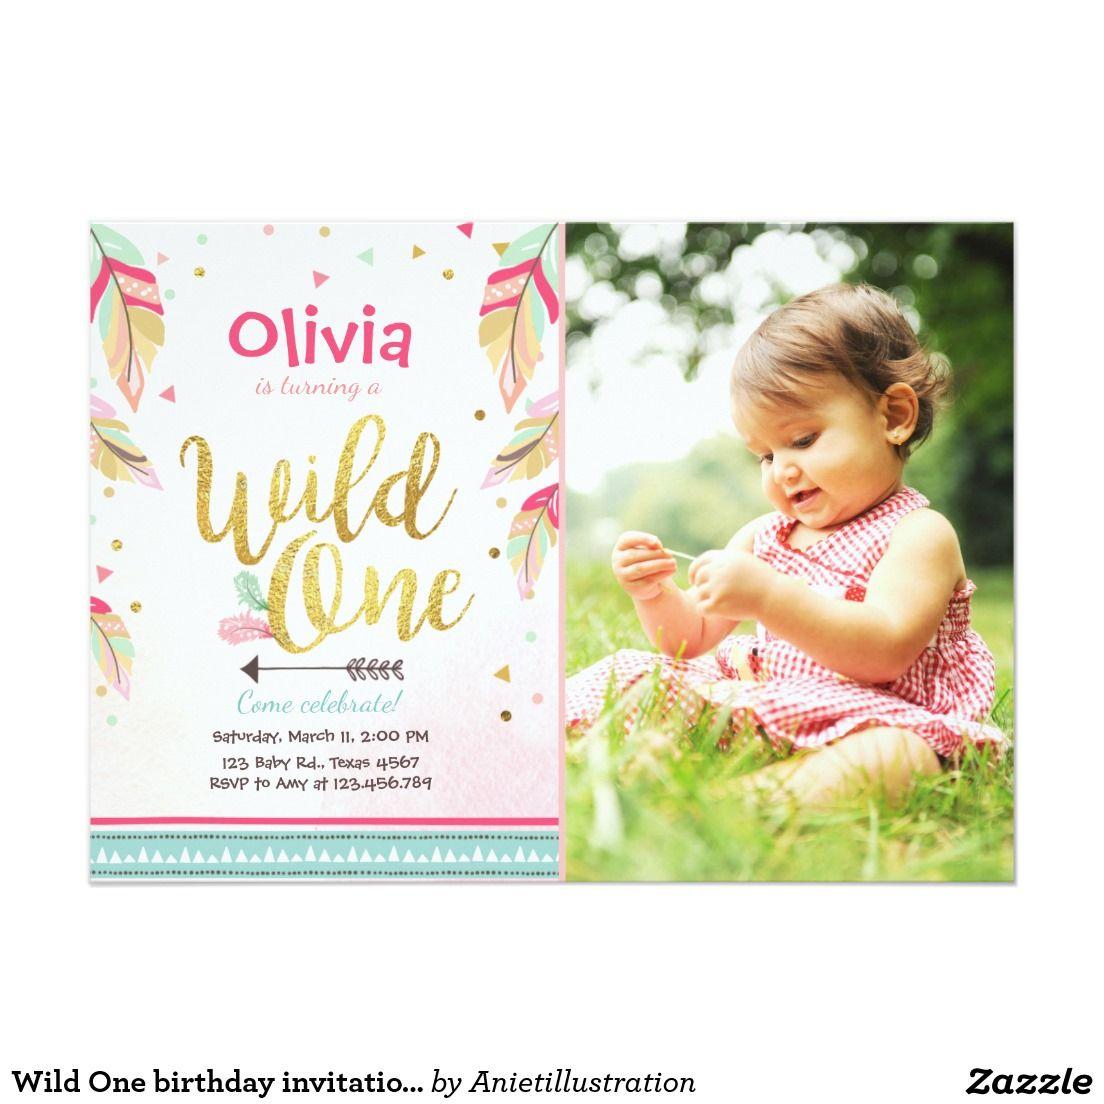 Wild One birthday invitation First birthday Girl   Xaneli bday ...